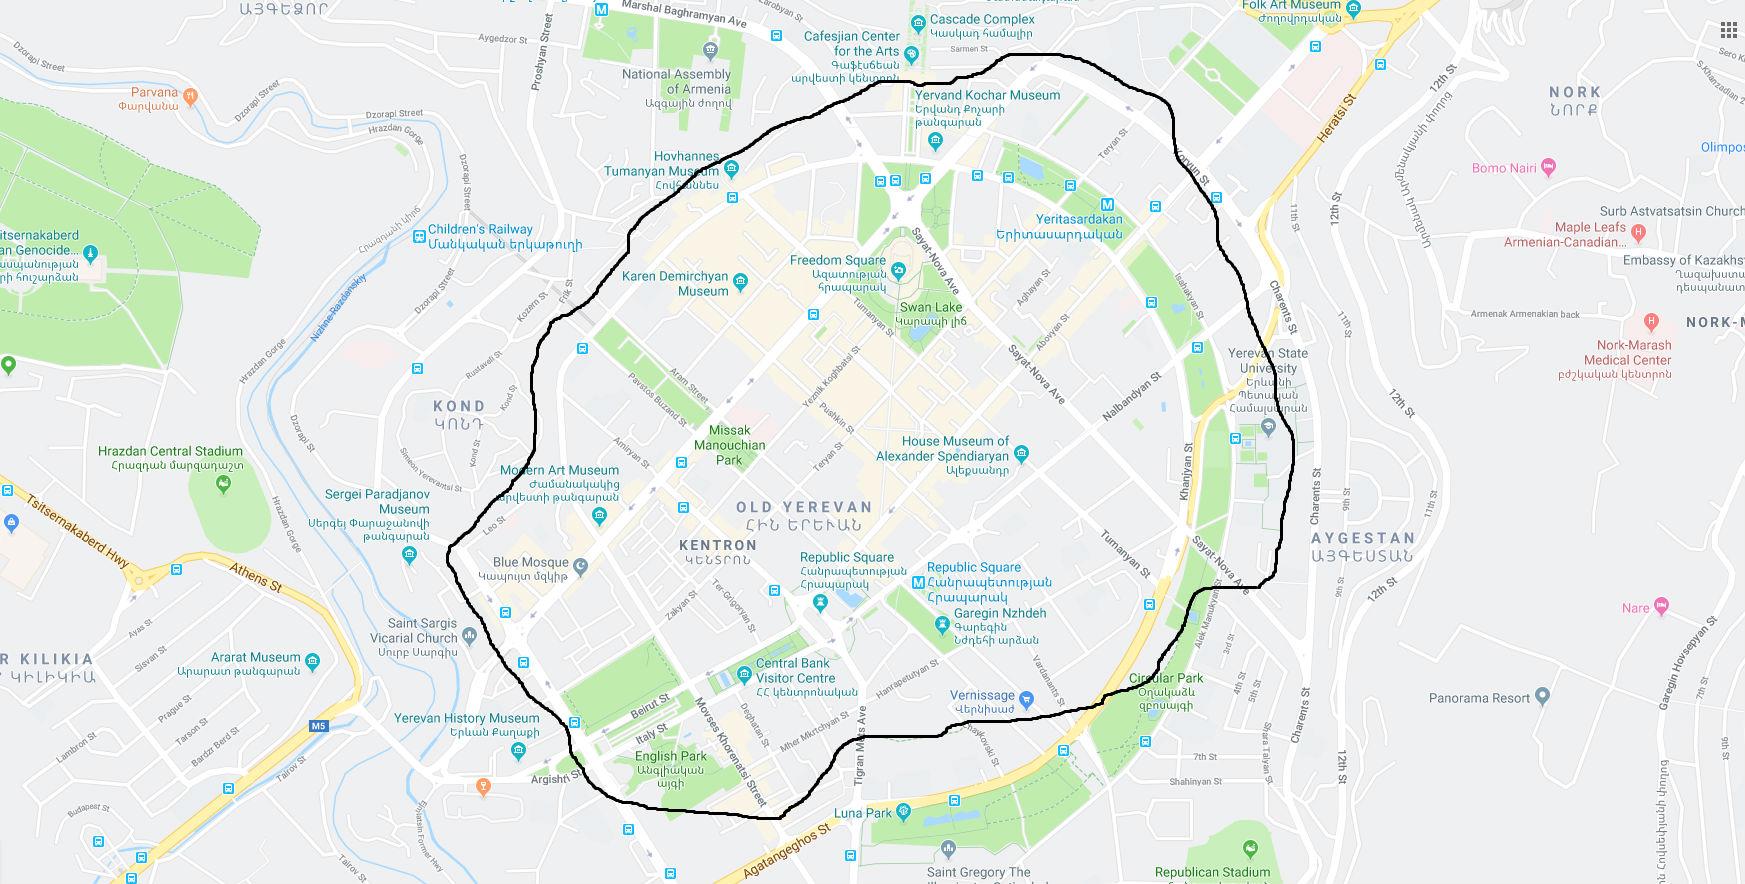 Map of Yerevan center